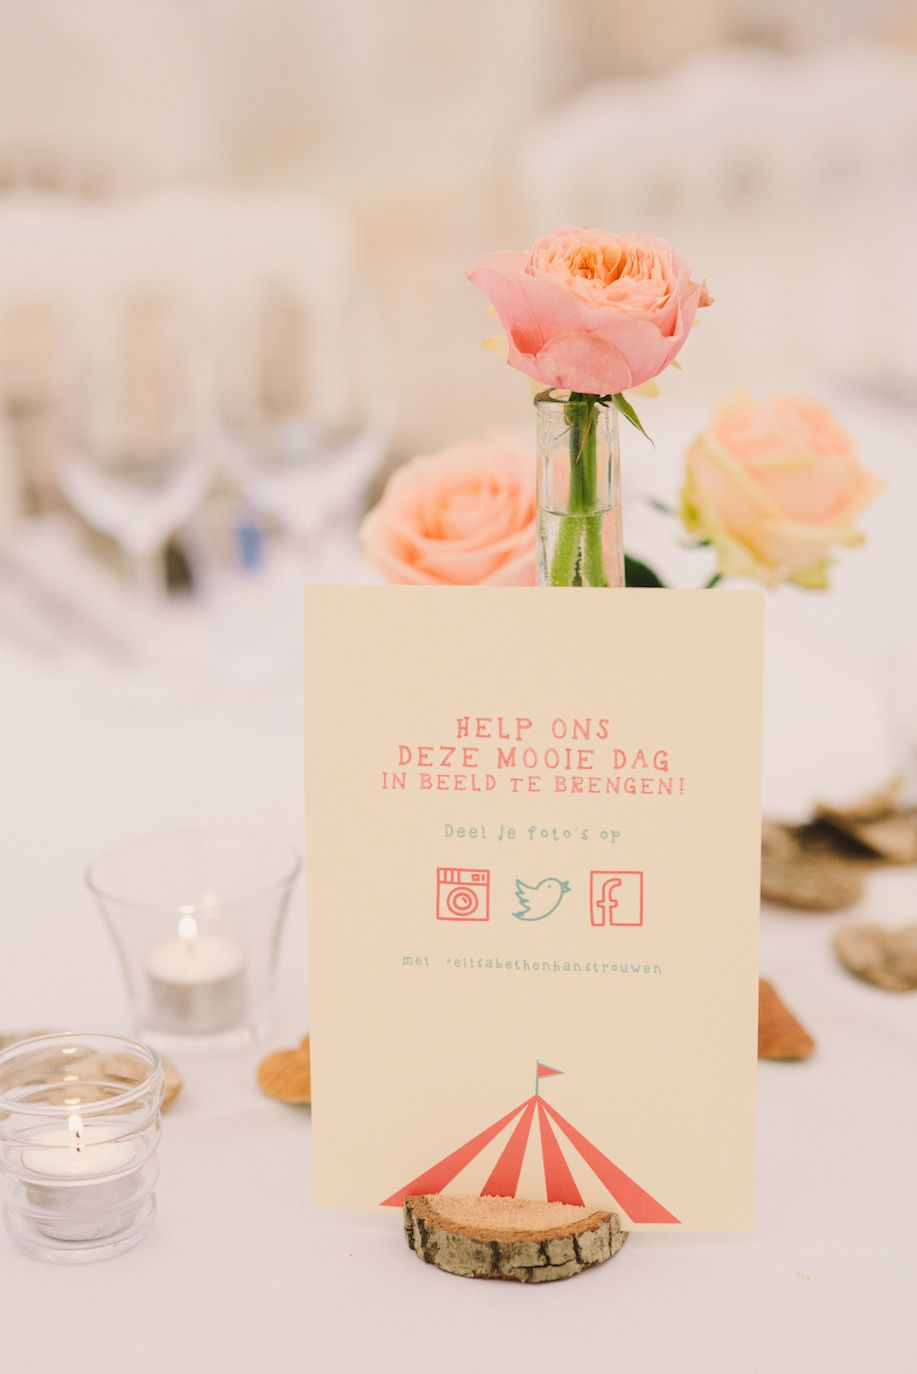 Pin by Kim Van der Heyden on AbsFab Real Life Weddings Pinterest